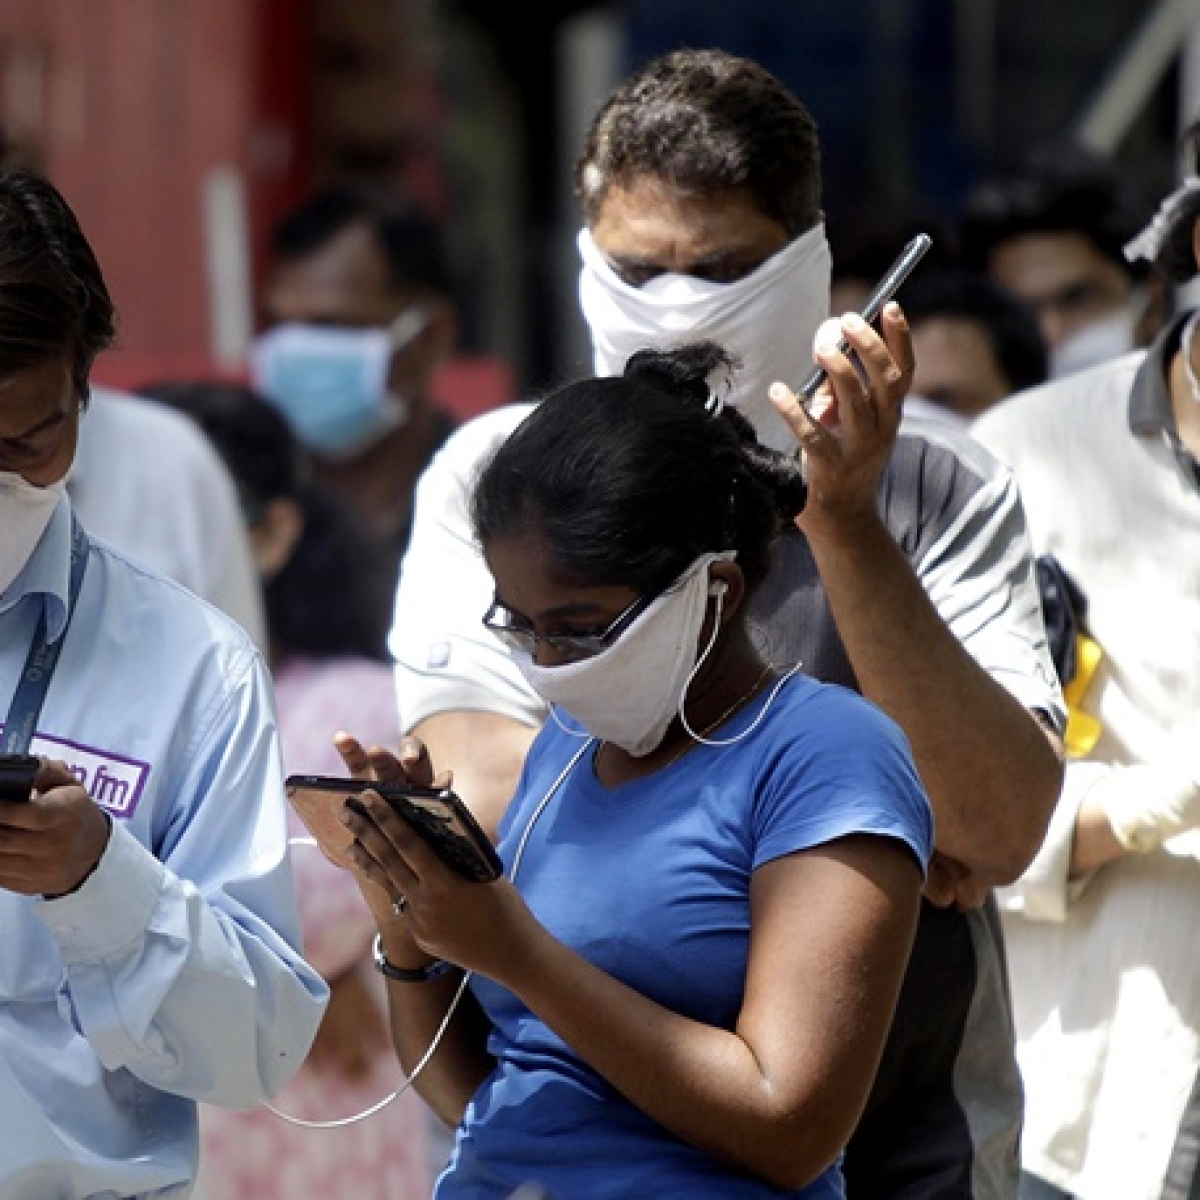 Coronavirus in Mumbai: 31 nurses, 5 doctors from Jaslok hospital test positive for COVID-19